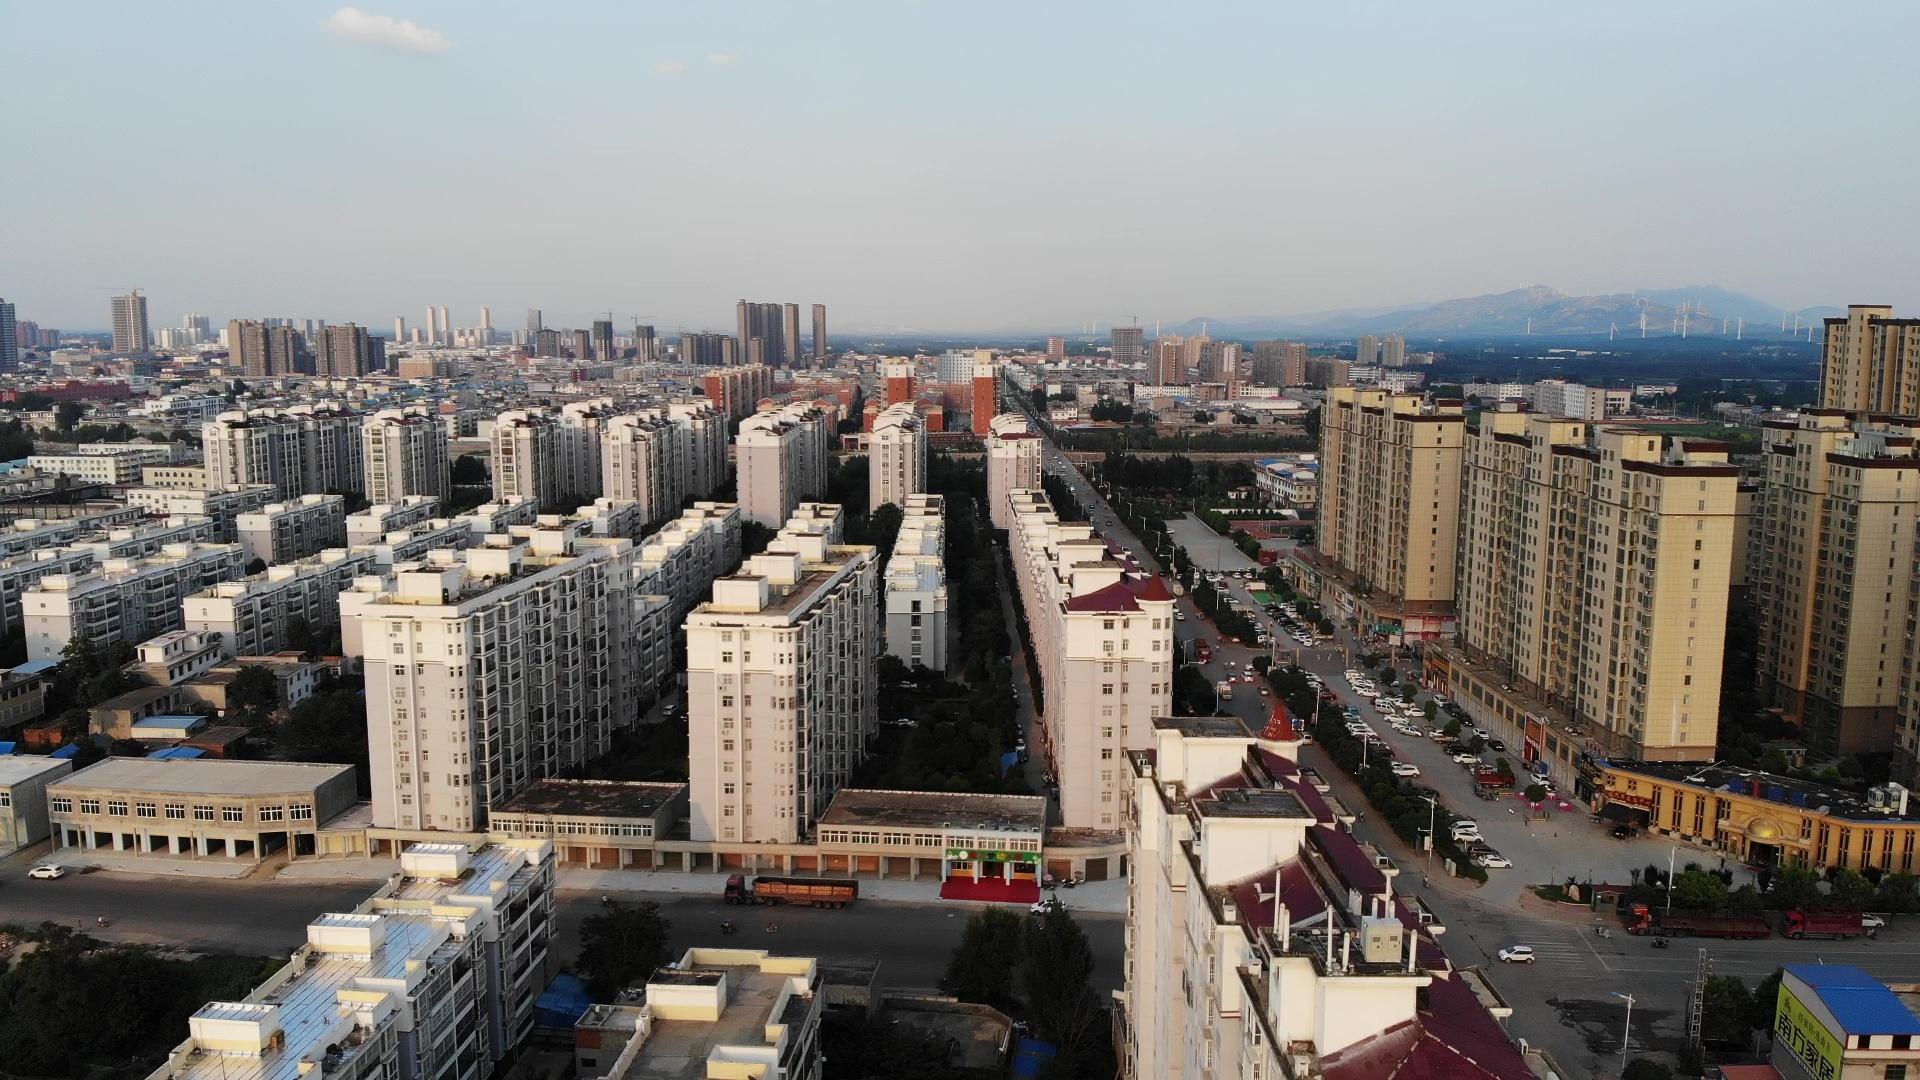 Fangcheng Apartment Complex